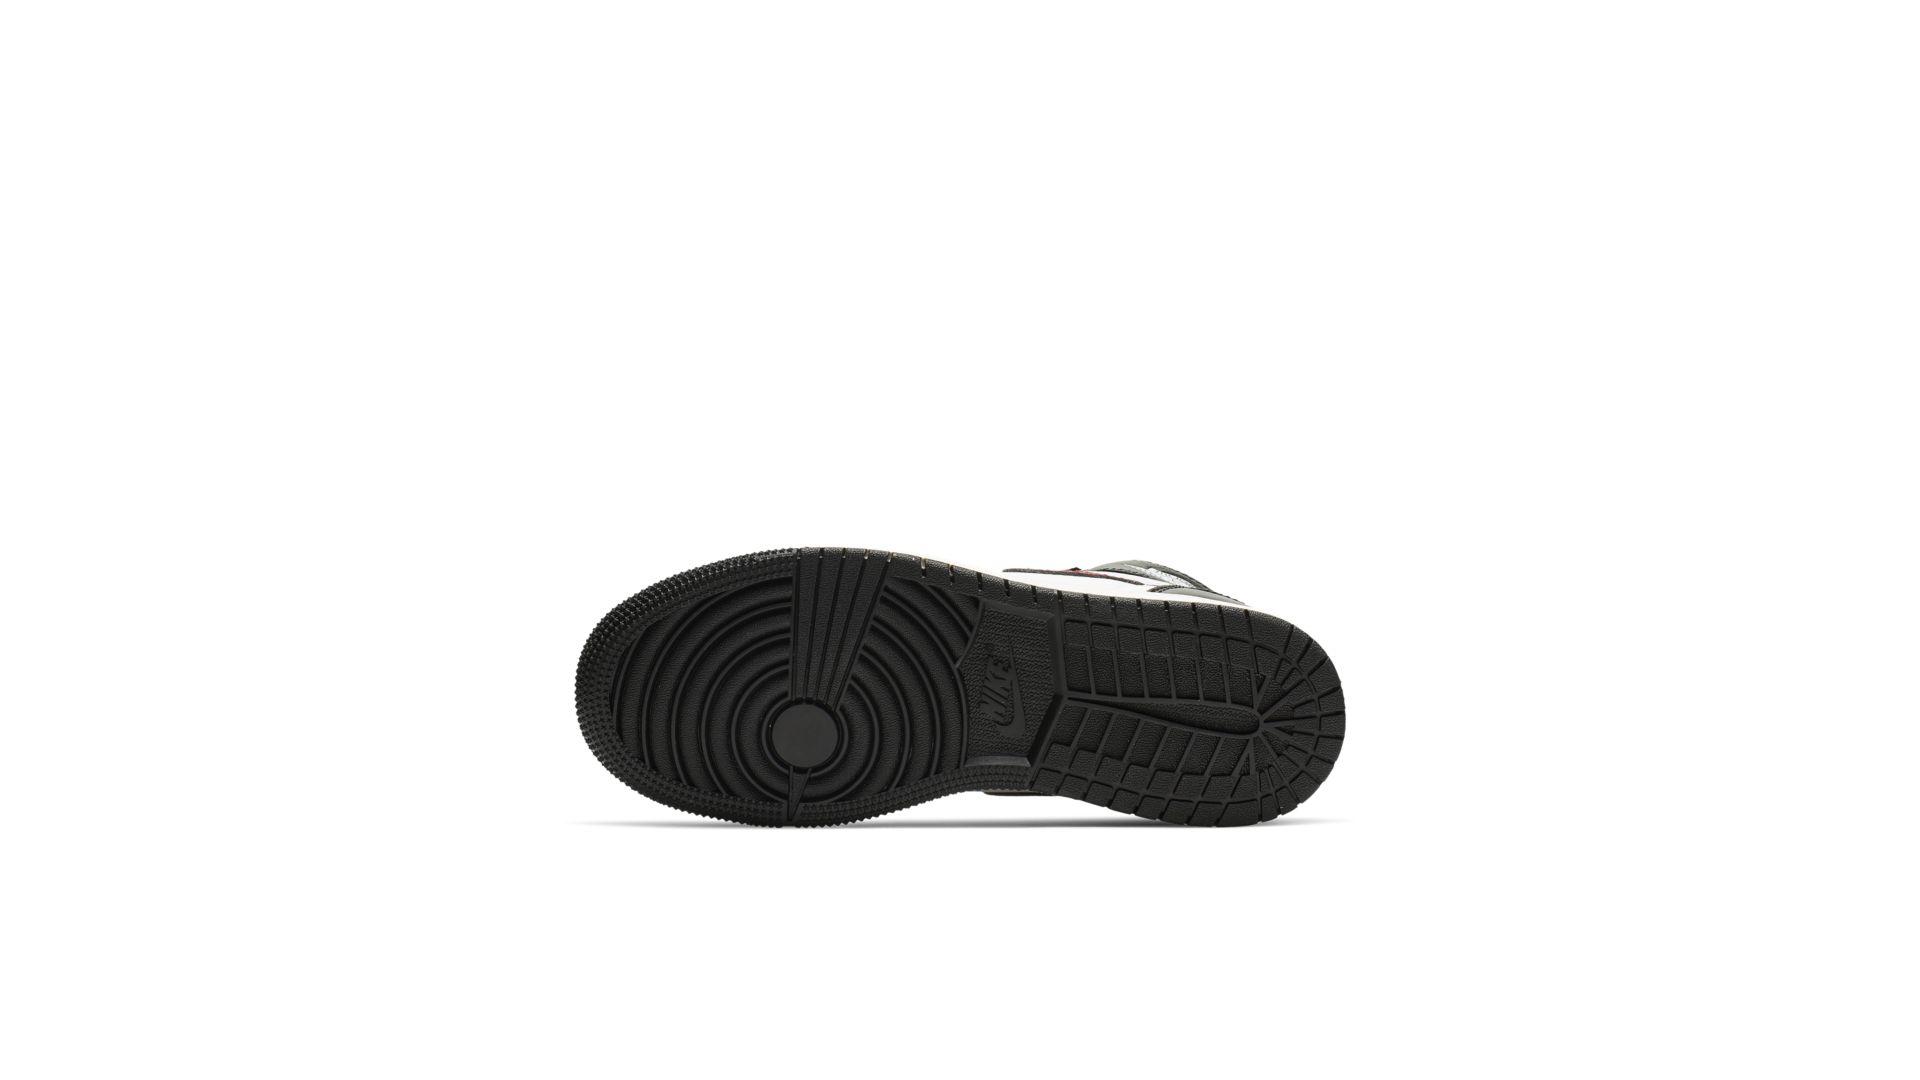 Jordan 1 Retro High Black Gym Red (GS) (575441-061)